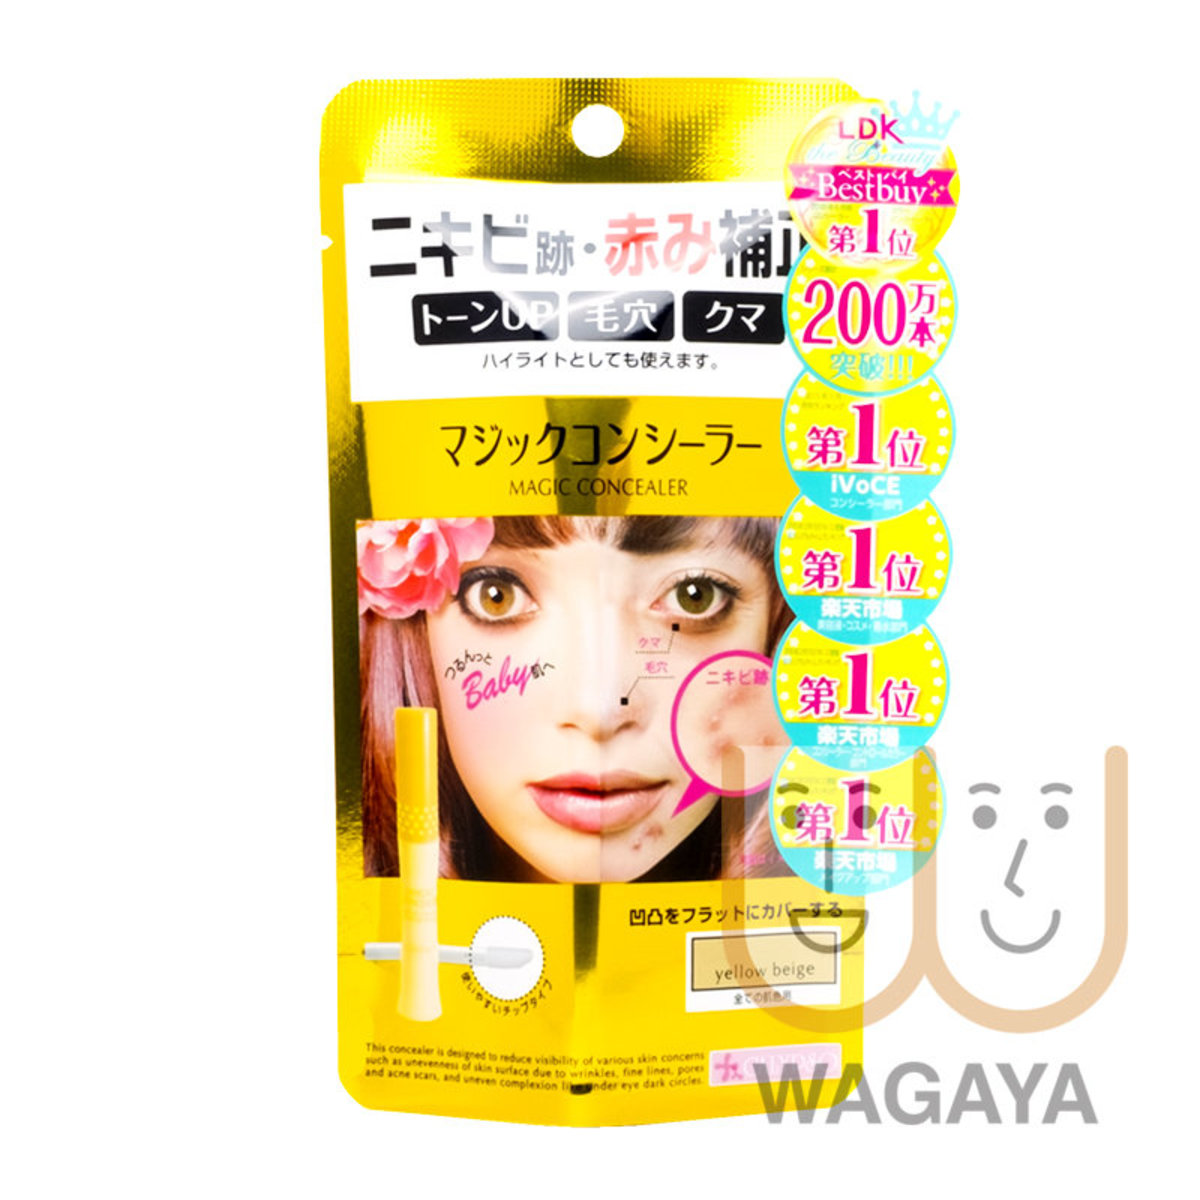 Magic Concealer 多功能魔法遮瑕膏 6g (黃色)  (平行進口貨品)